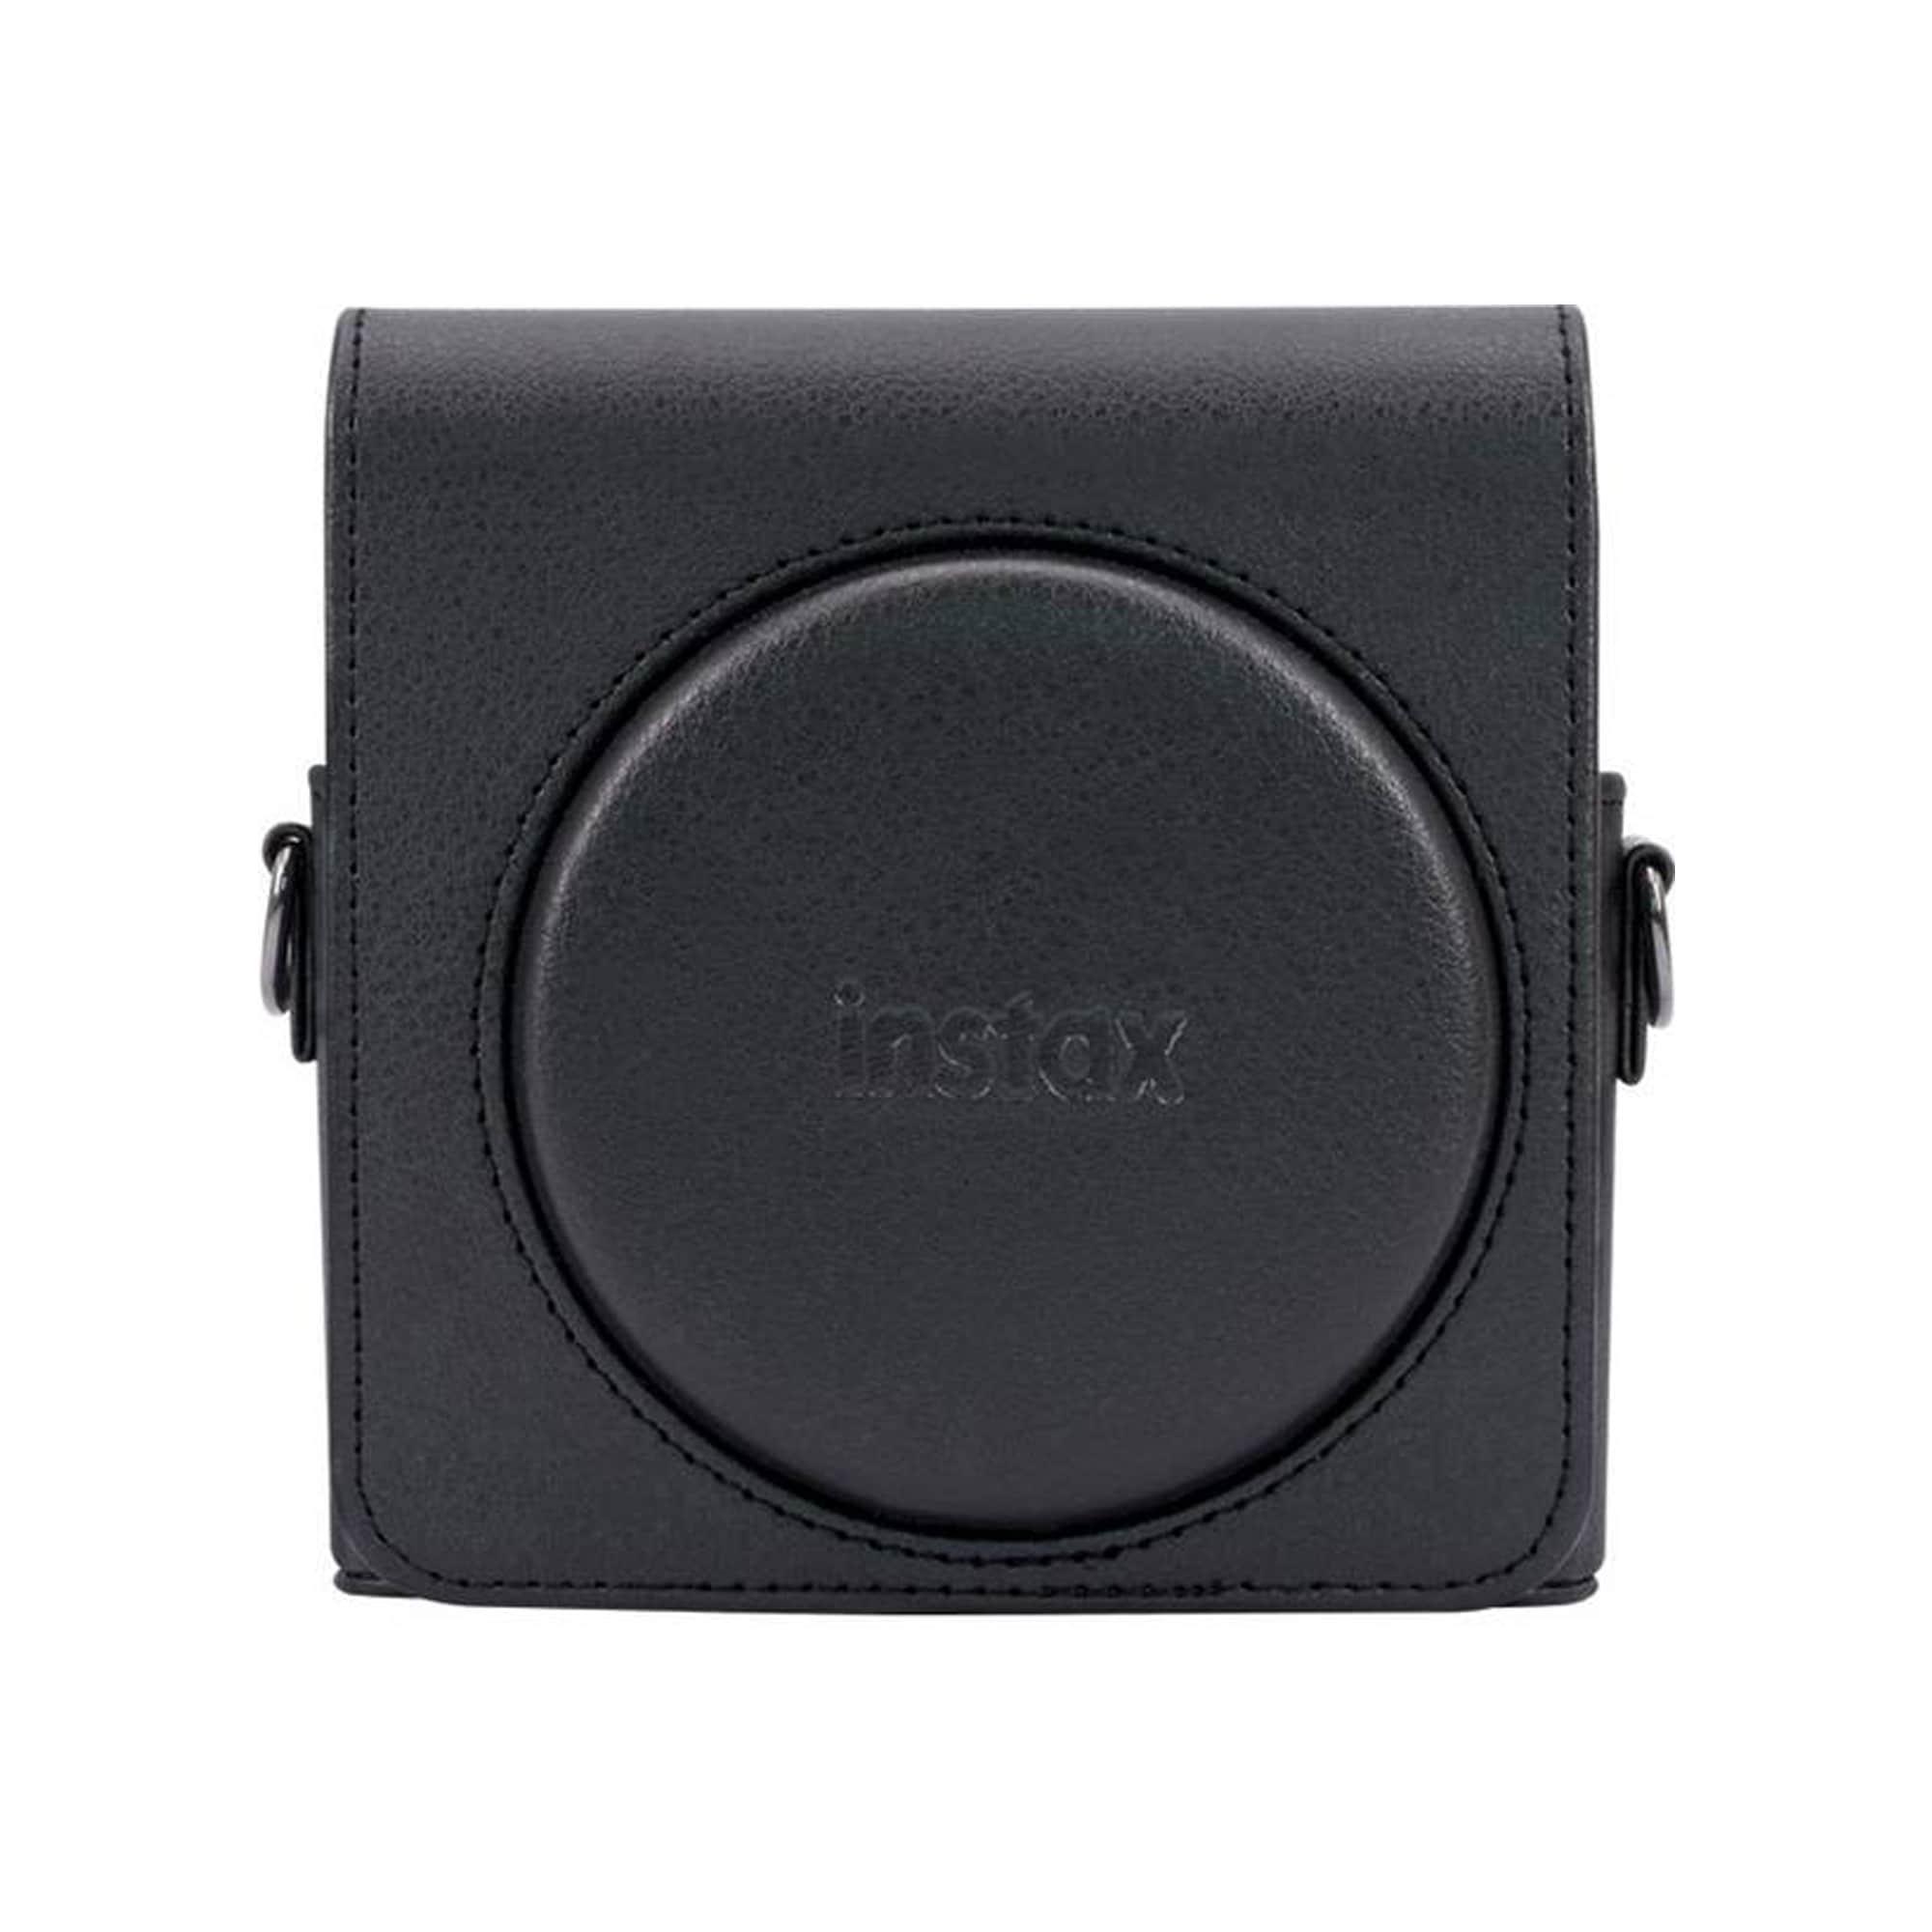 Fujifilm Instax Square 6 Väska Svart